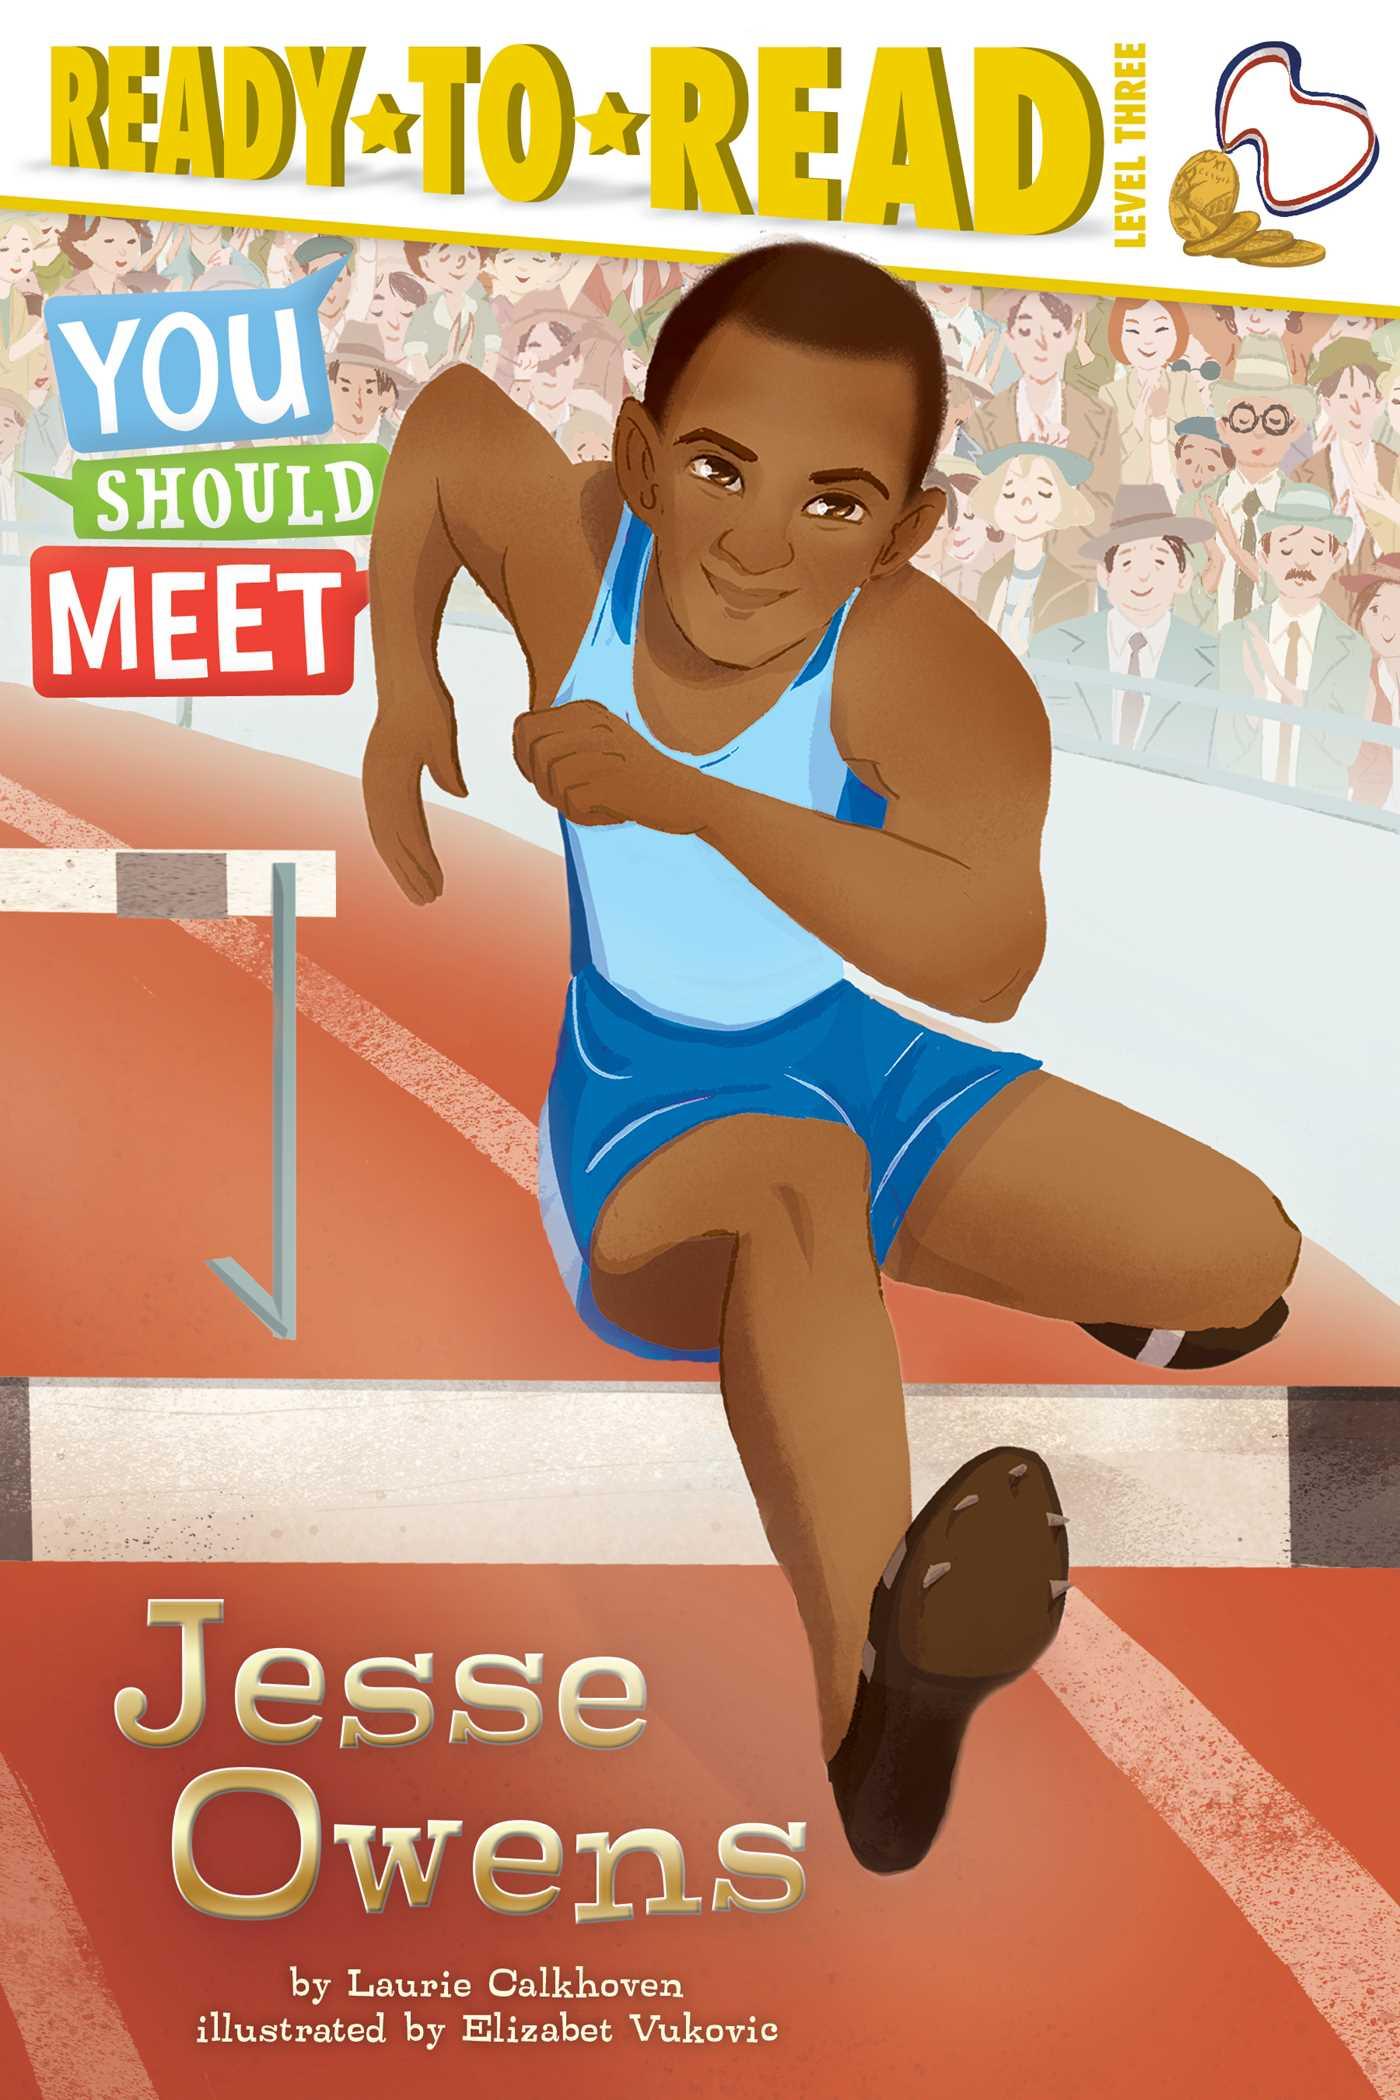 Jesse owens 9781481480956 hr